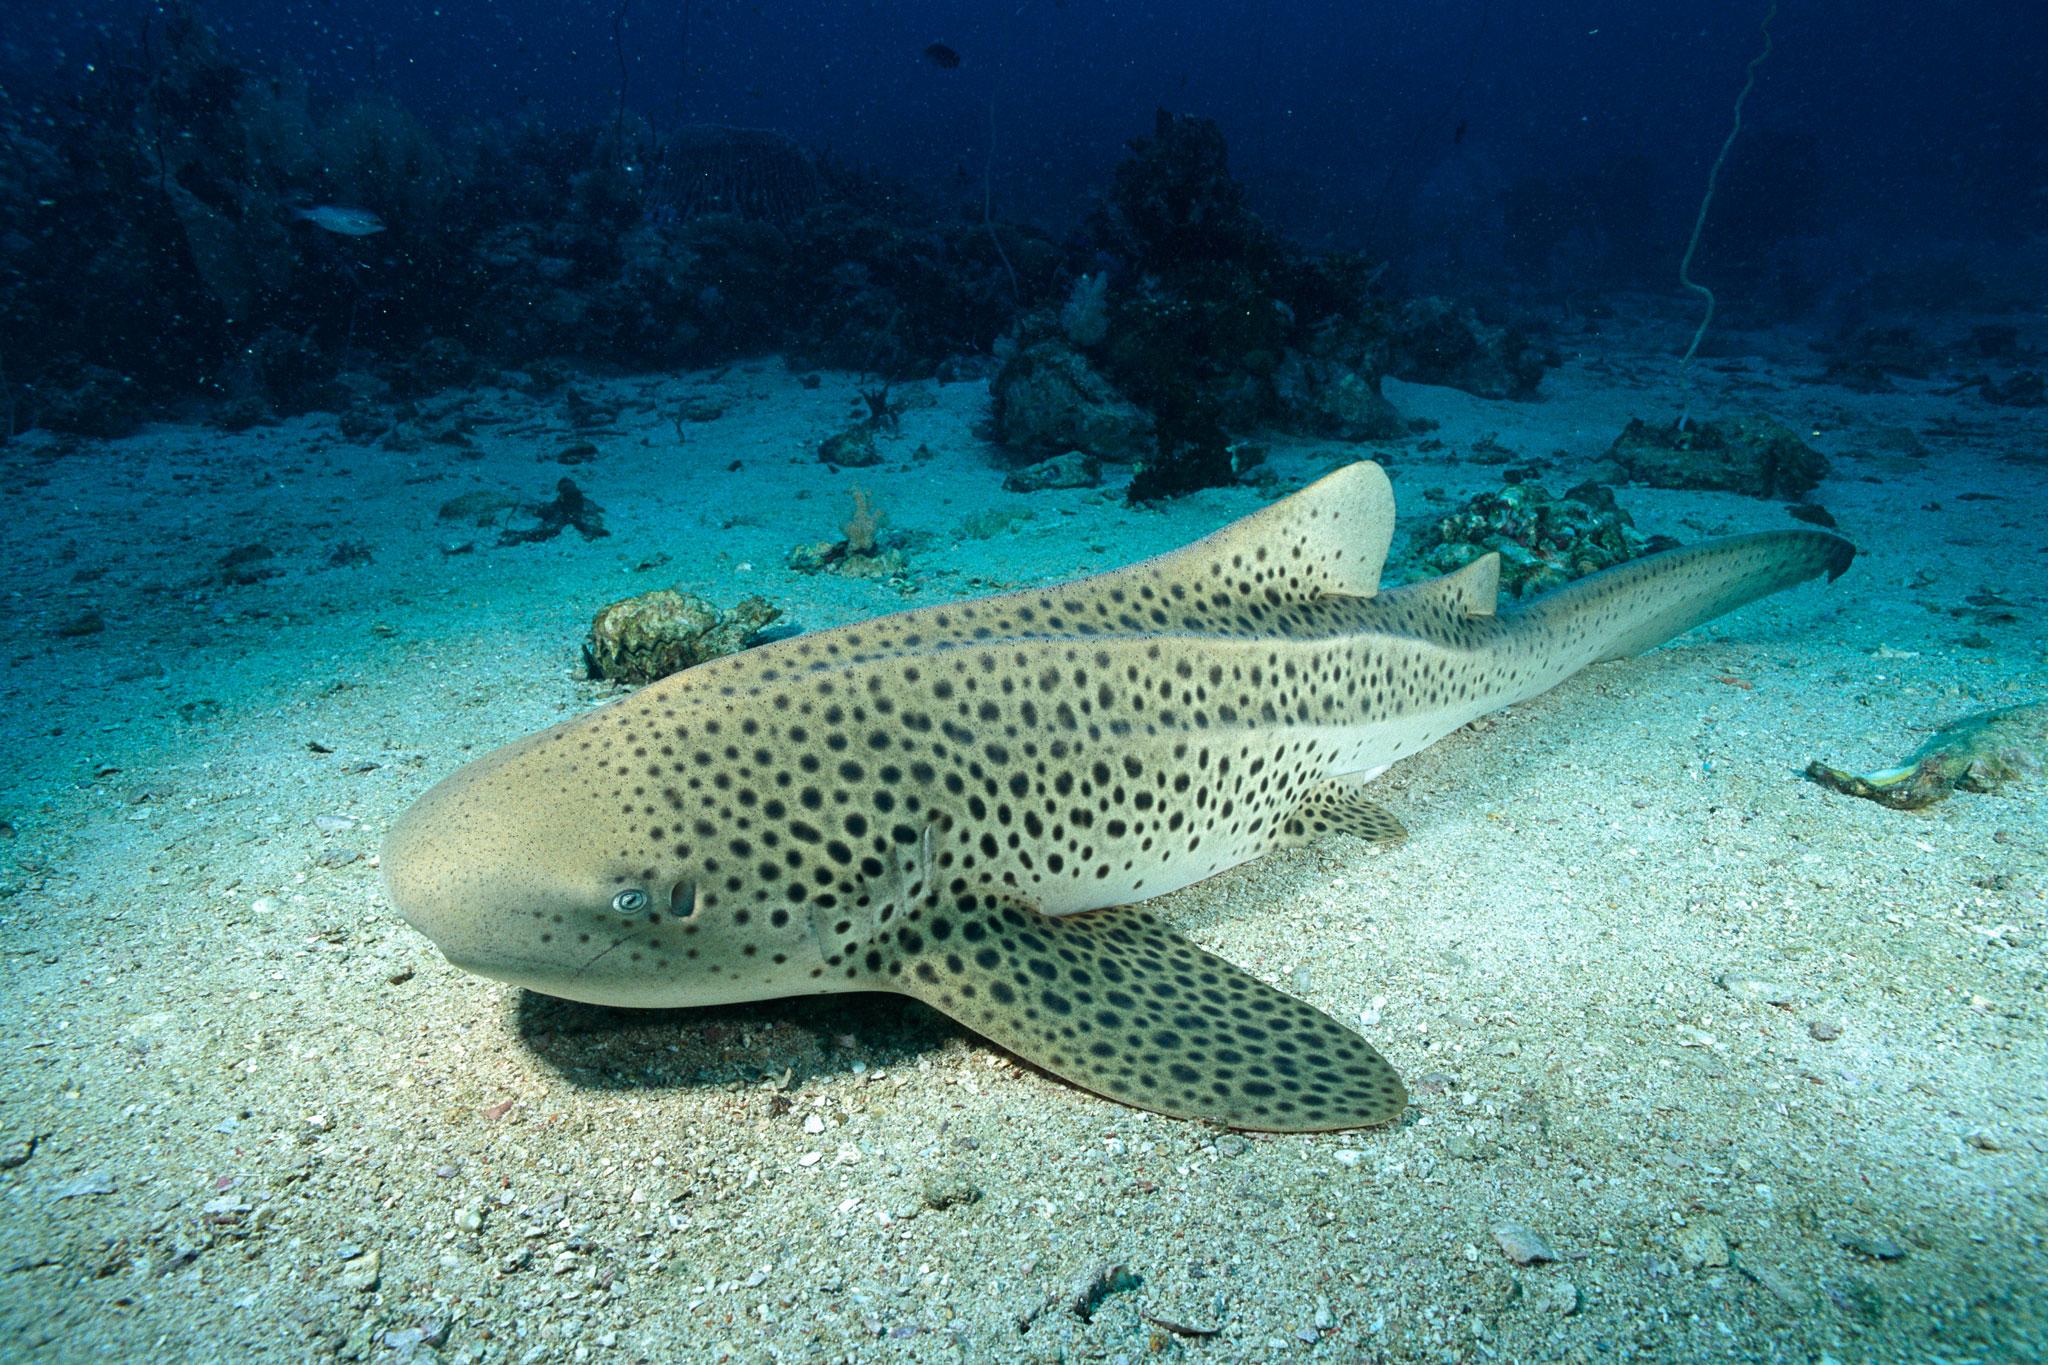 HQ Leopard Shark Wallpapers | File 903.73Kb